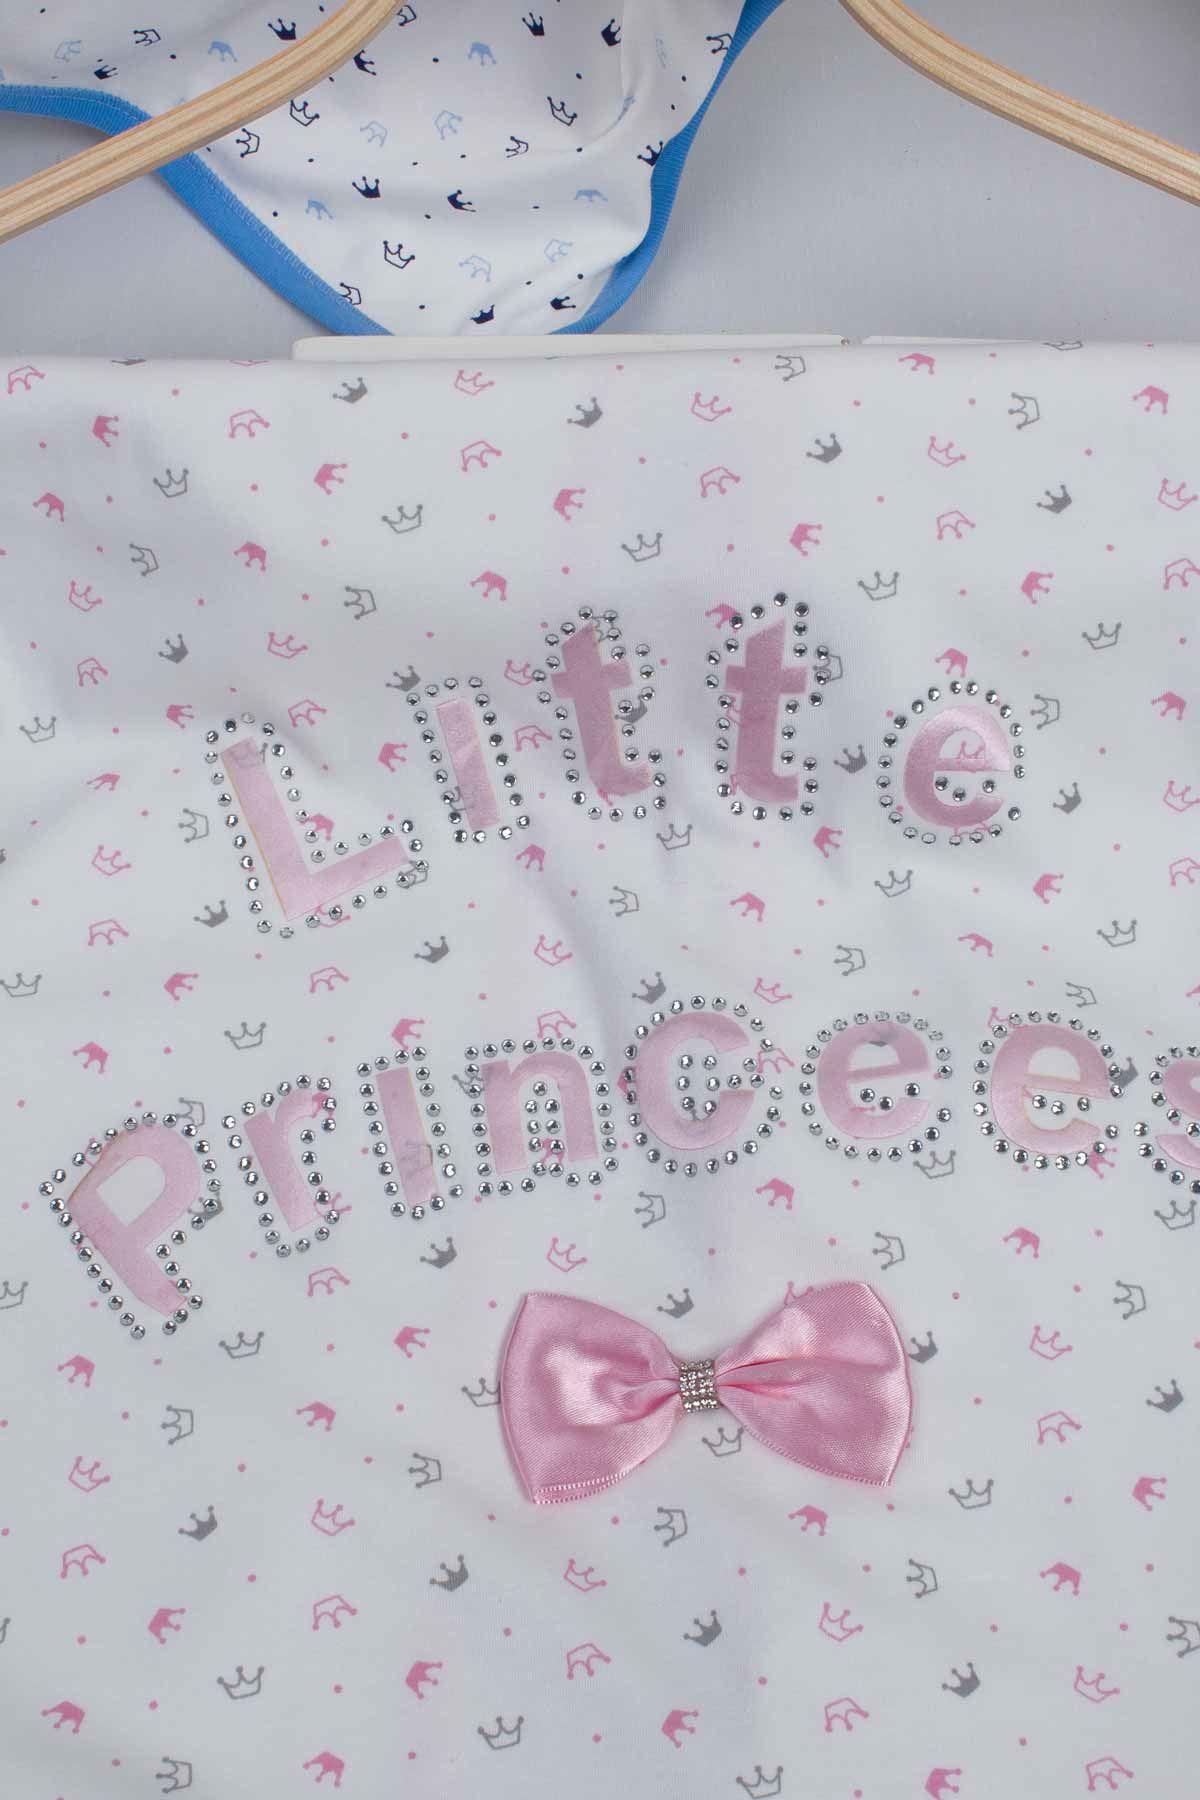 Pink Girl Baby Blanket Lıtte Queen Girls Babies Newborn Cotton Soft Antibacterial Infants Girls Princess 80*85 Cm Blankets model